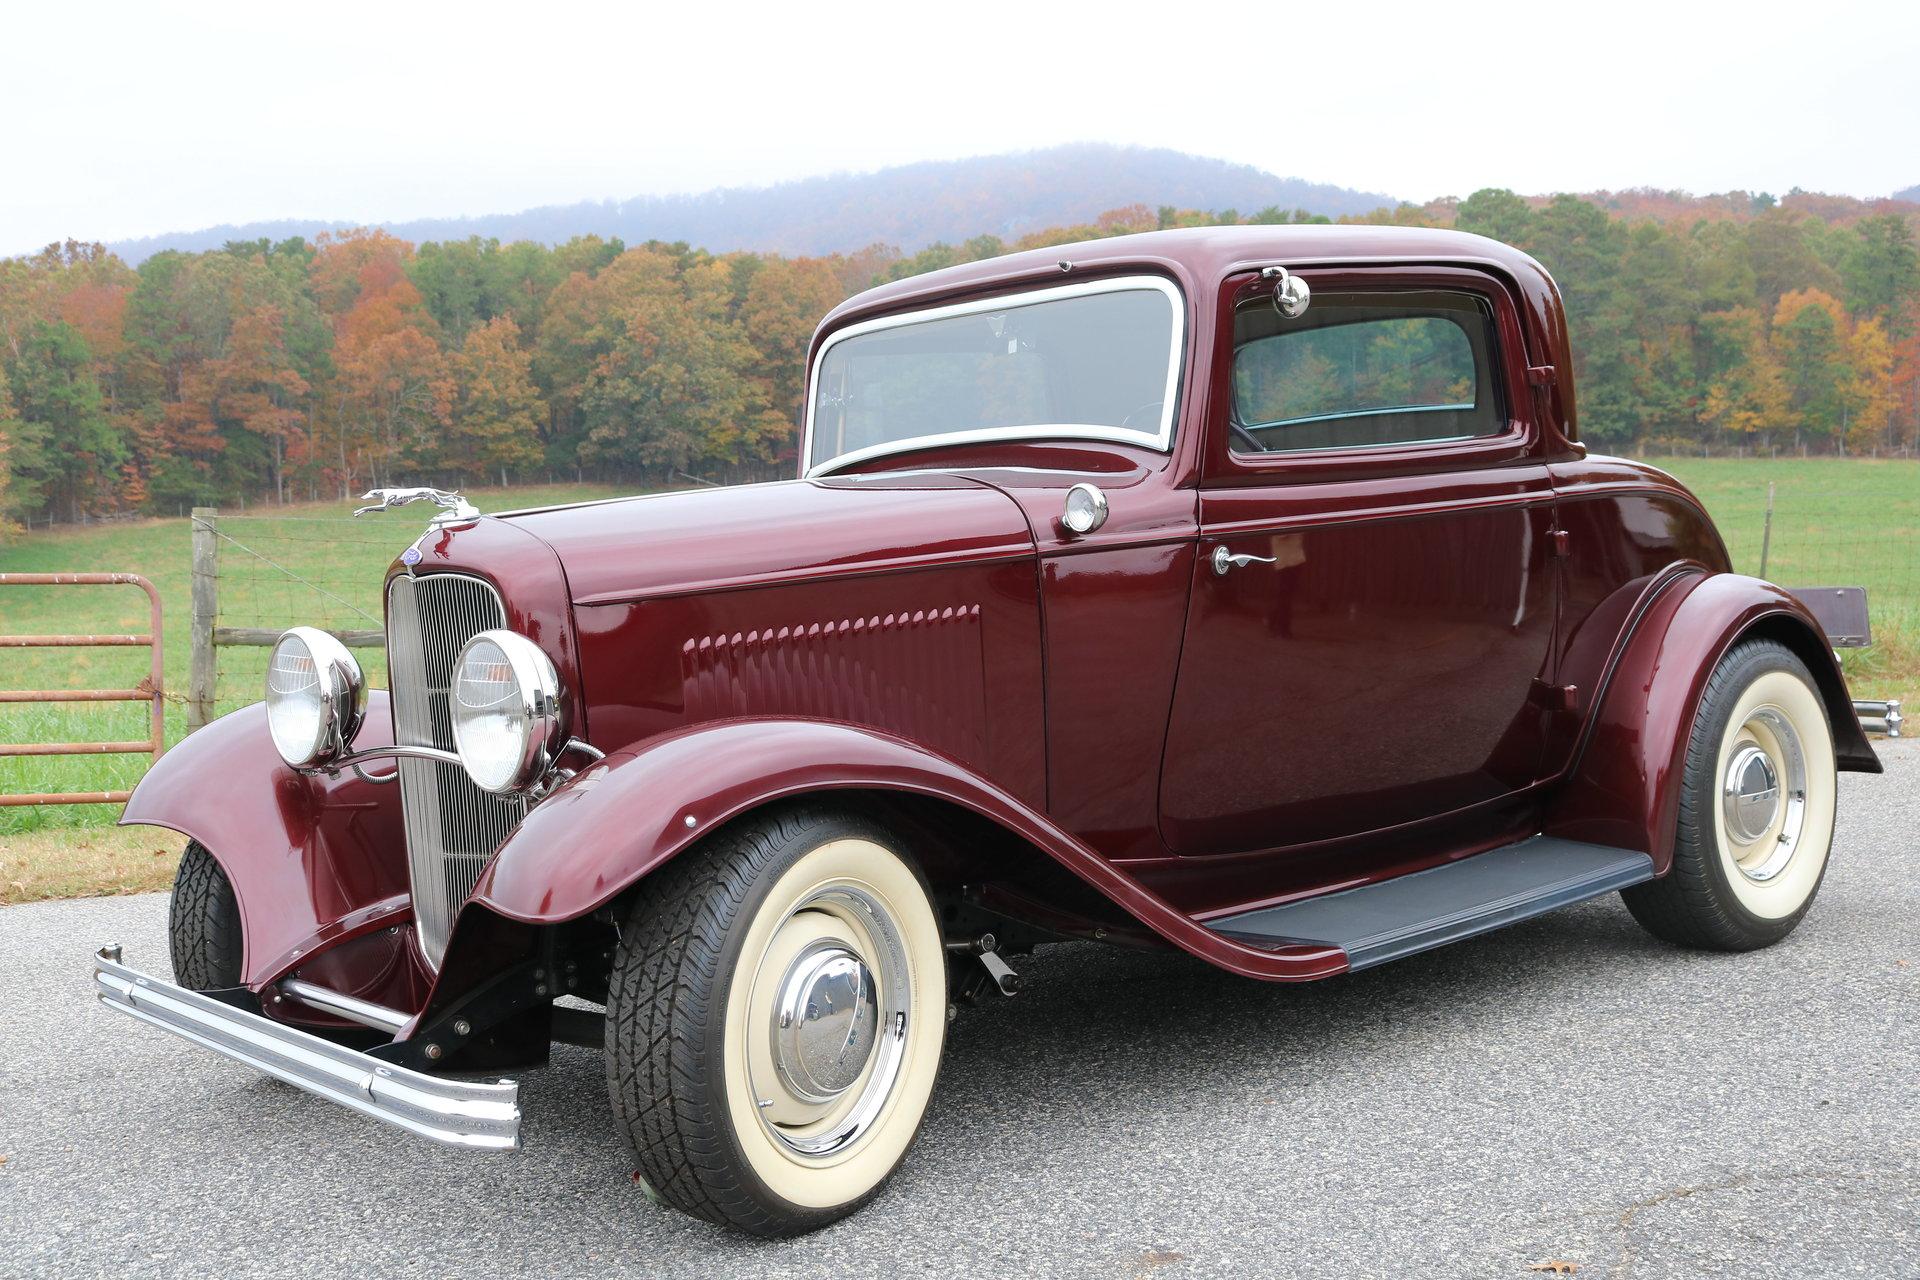 1932 Ford 3 Window Coupe | GAA Classic Cars